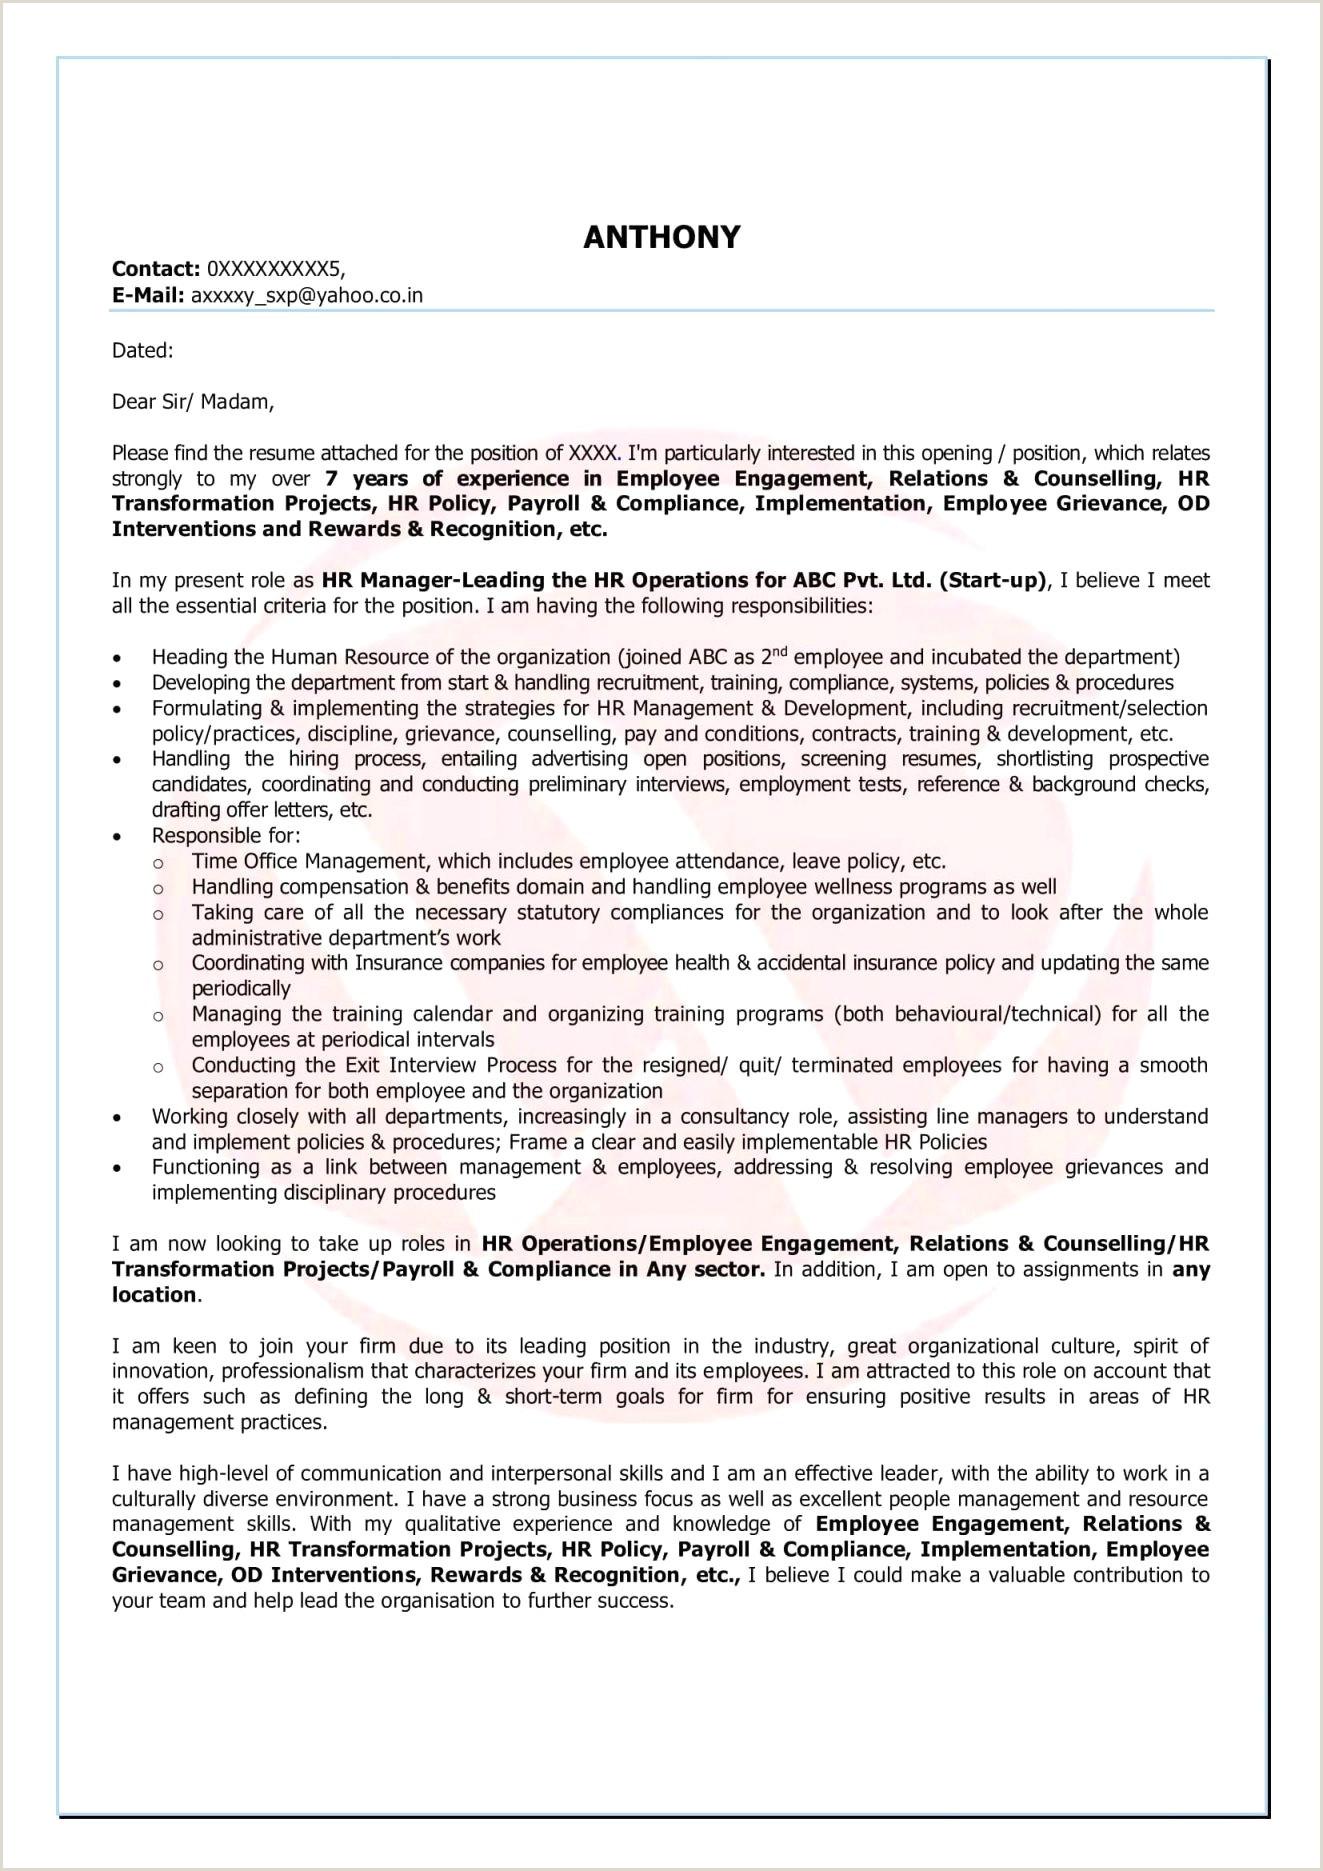 Curriculum Vitae Para Rellenar En Espa±ol šnico Curriculumvt